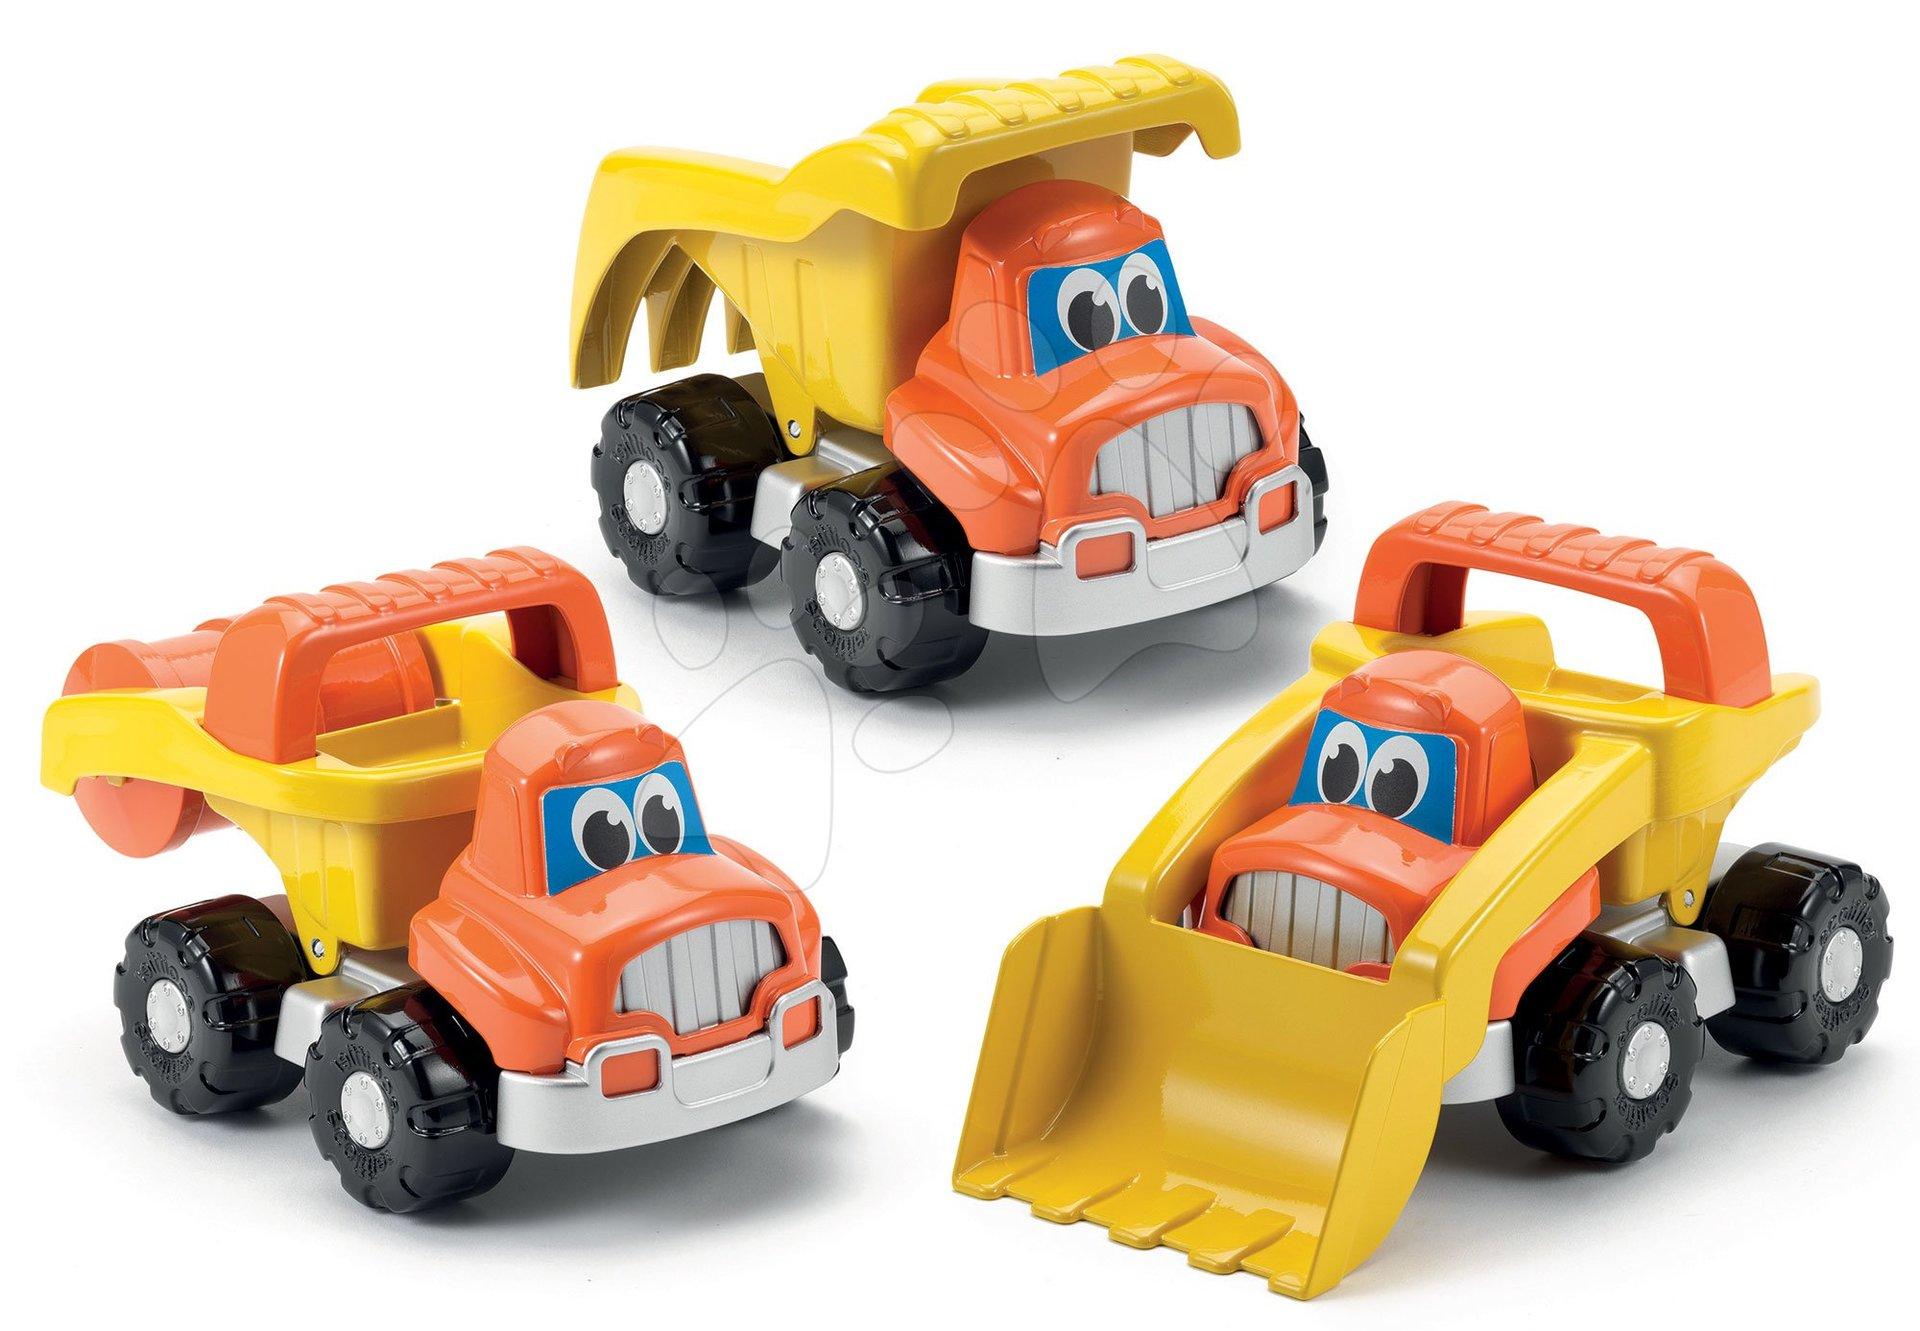 Set stavebné autá Bob stavbár Écoiffier vyklápačka, cestný valec, bager oranžové od 18 mes